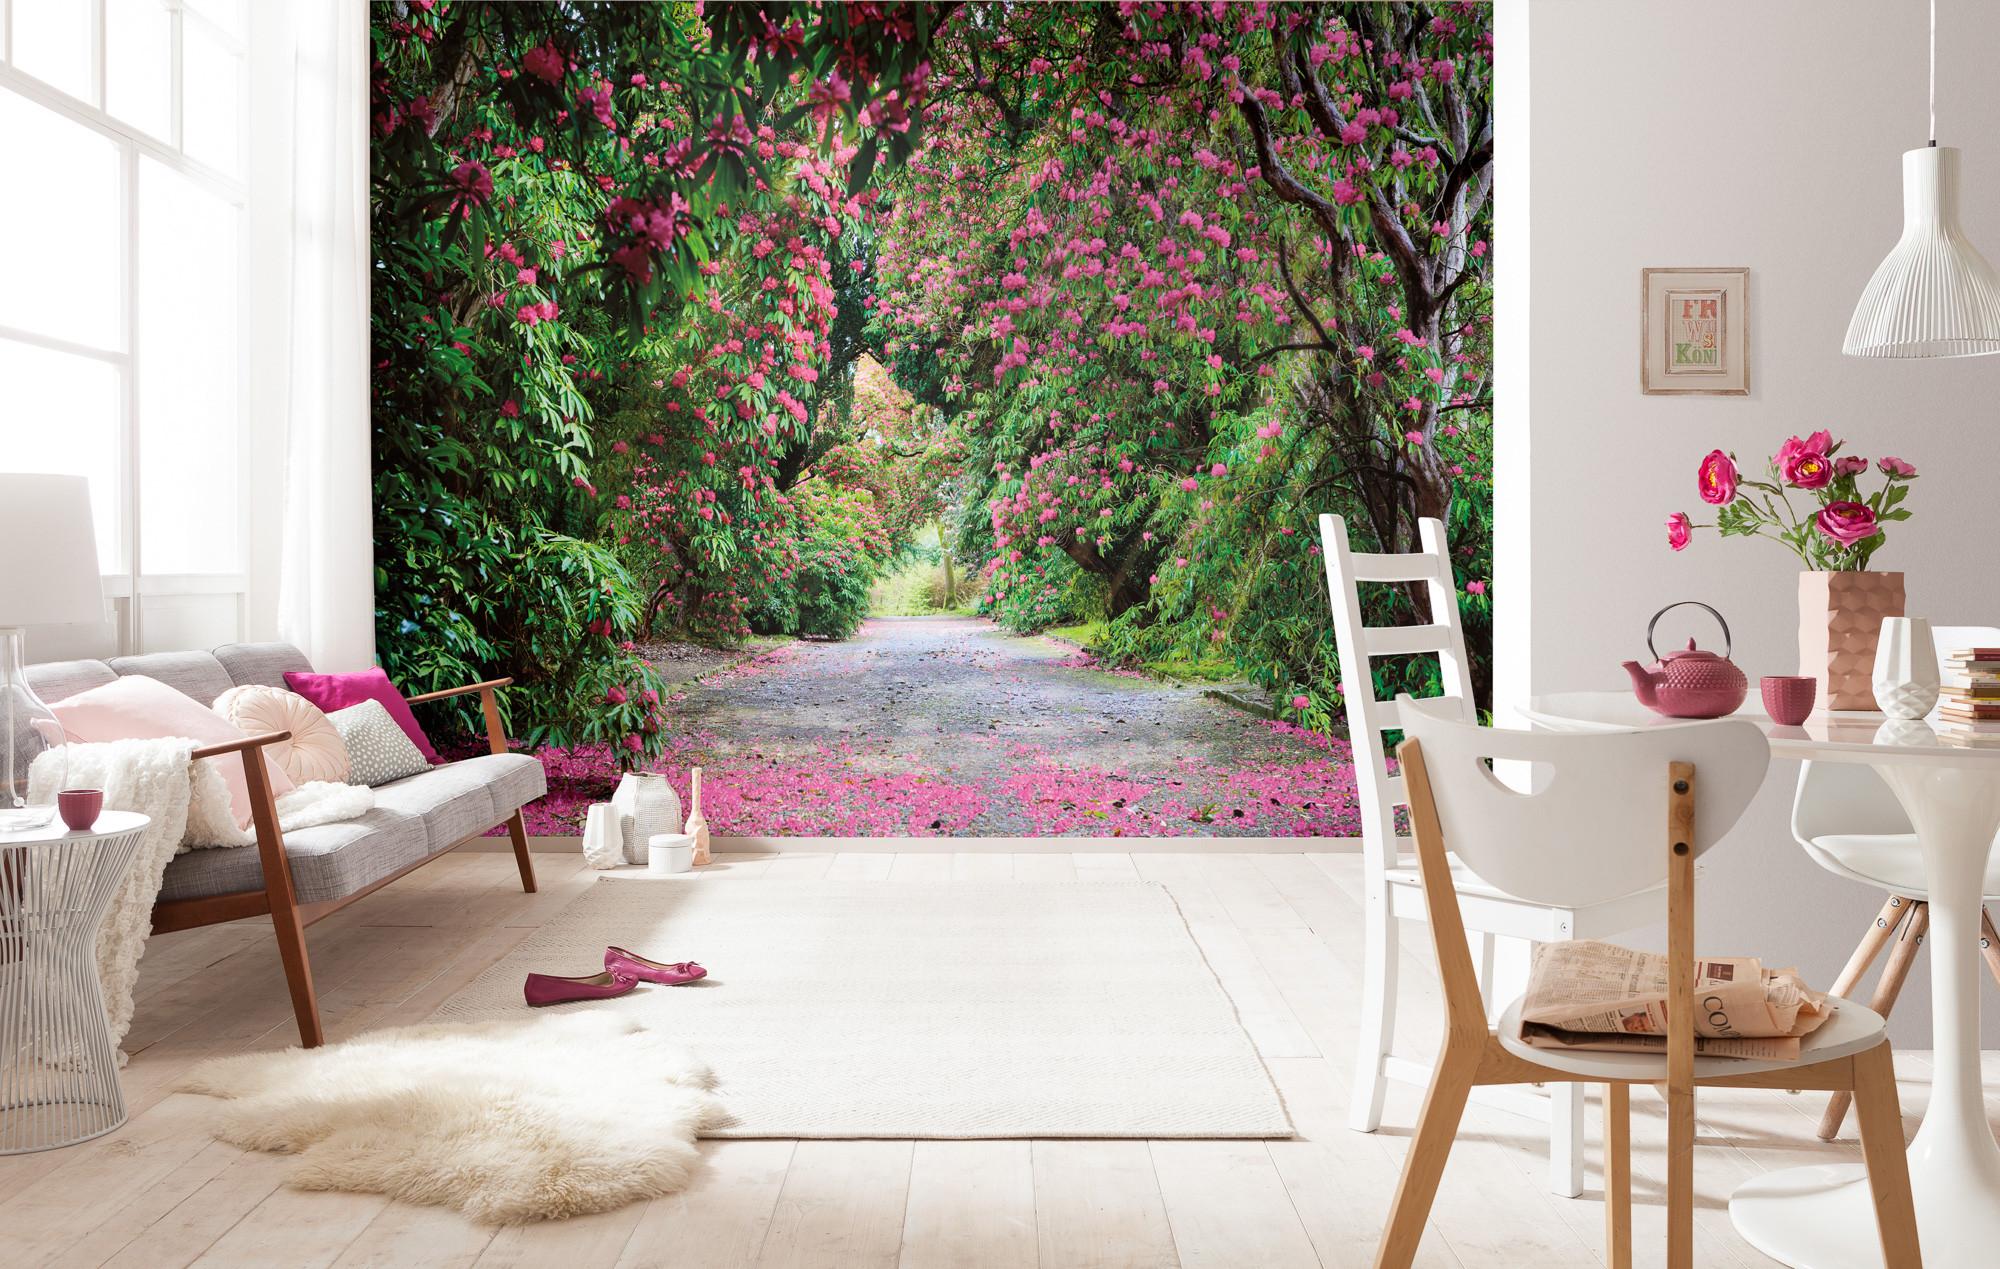 fototapete wicklow park von komar. Black Bedroom Furniture Sets. Home Design Ideas